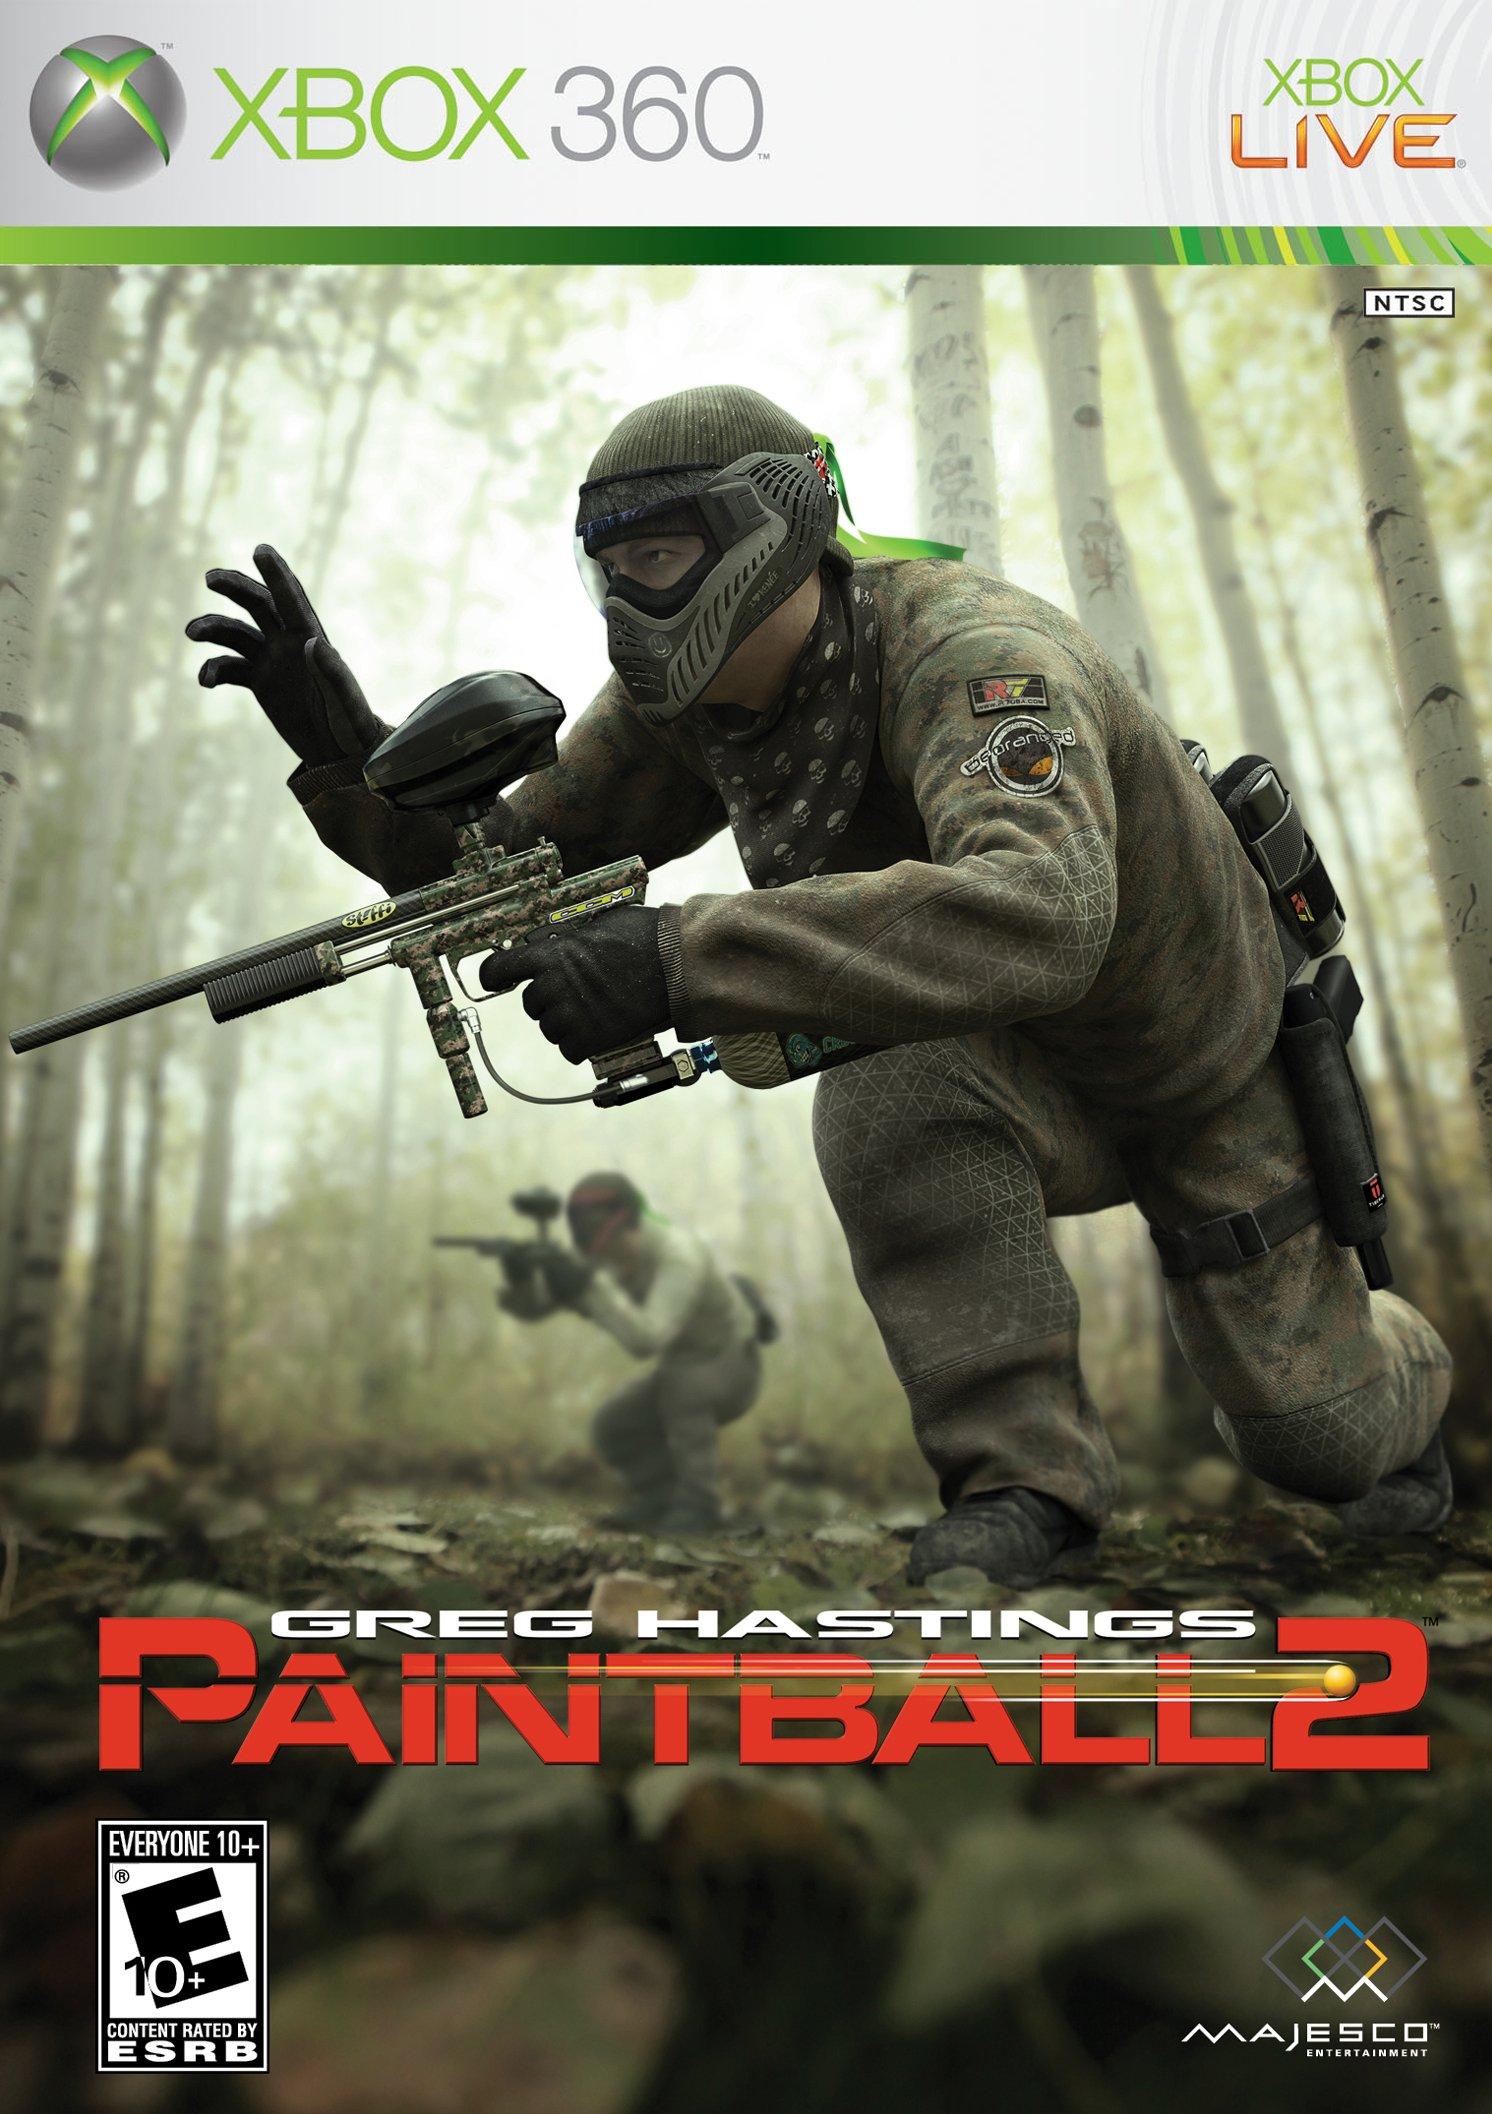 Greg Hastings' Paintball 2 - Xbox 360